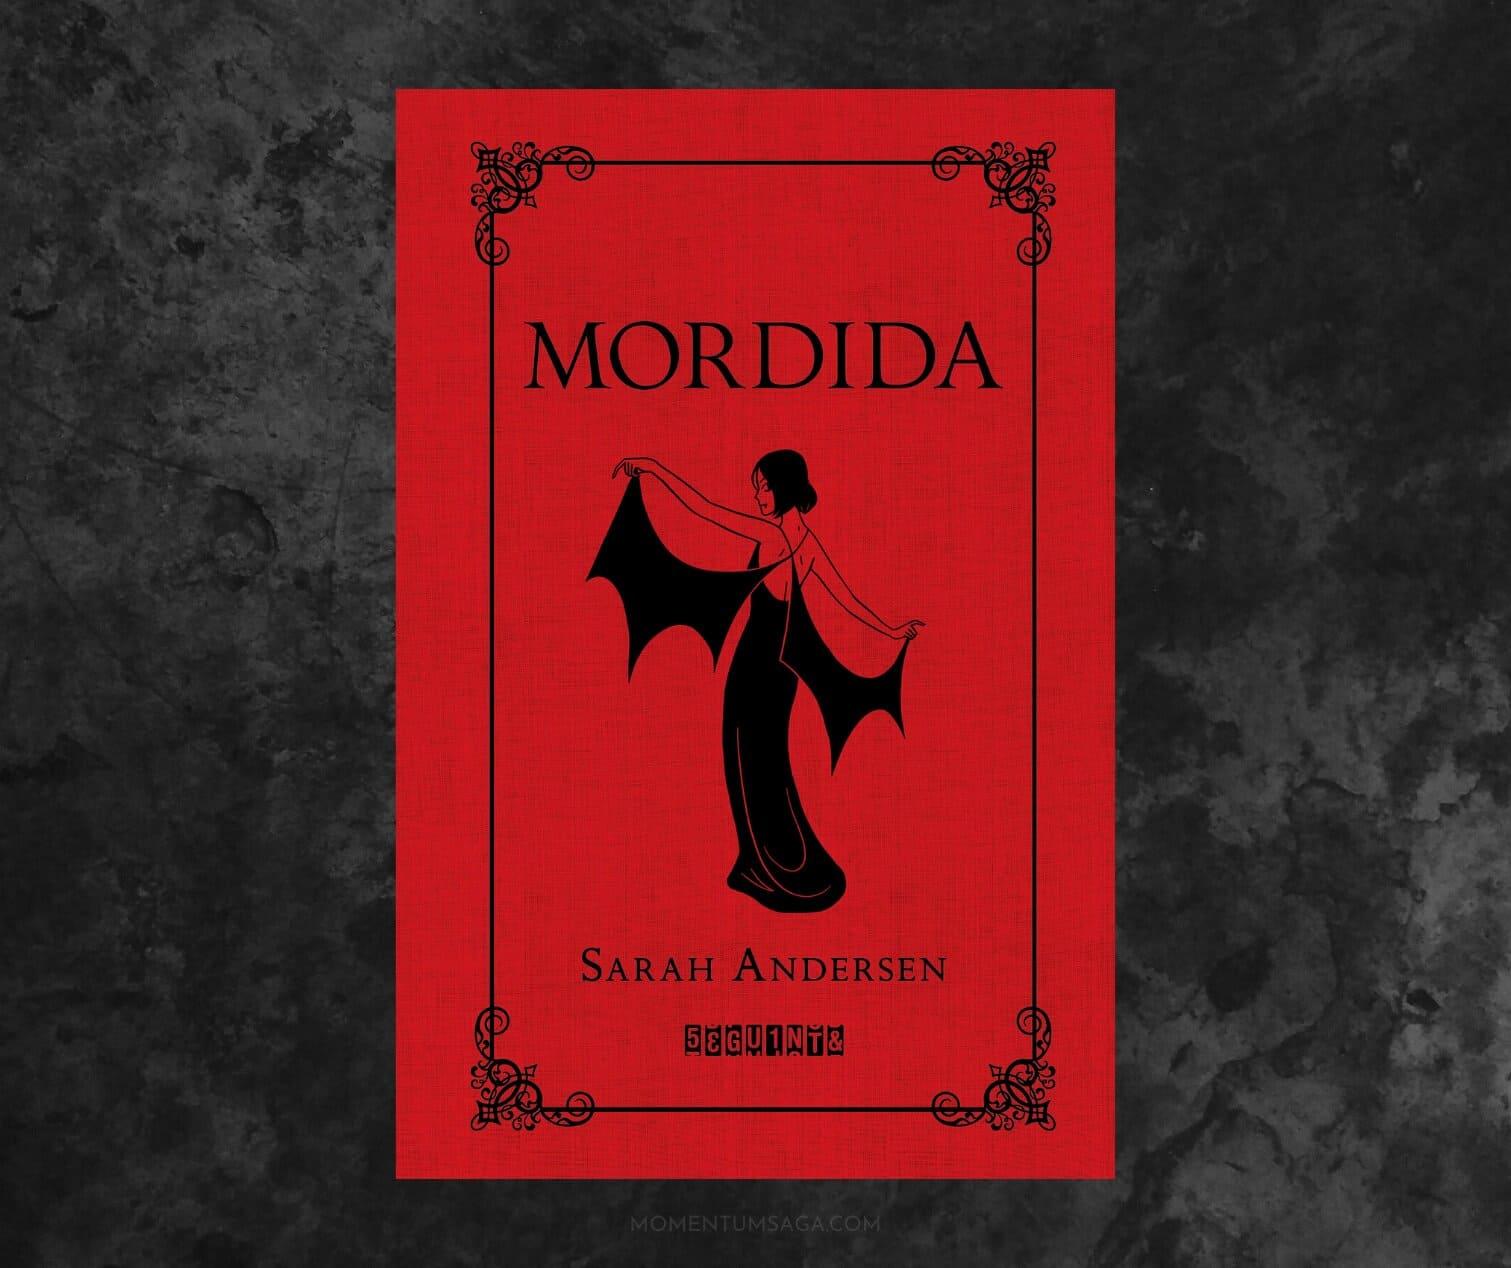 Resenha: Mordida, de Sarah Andersen